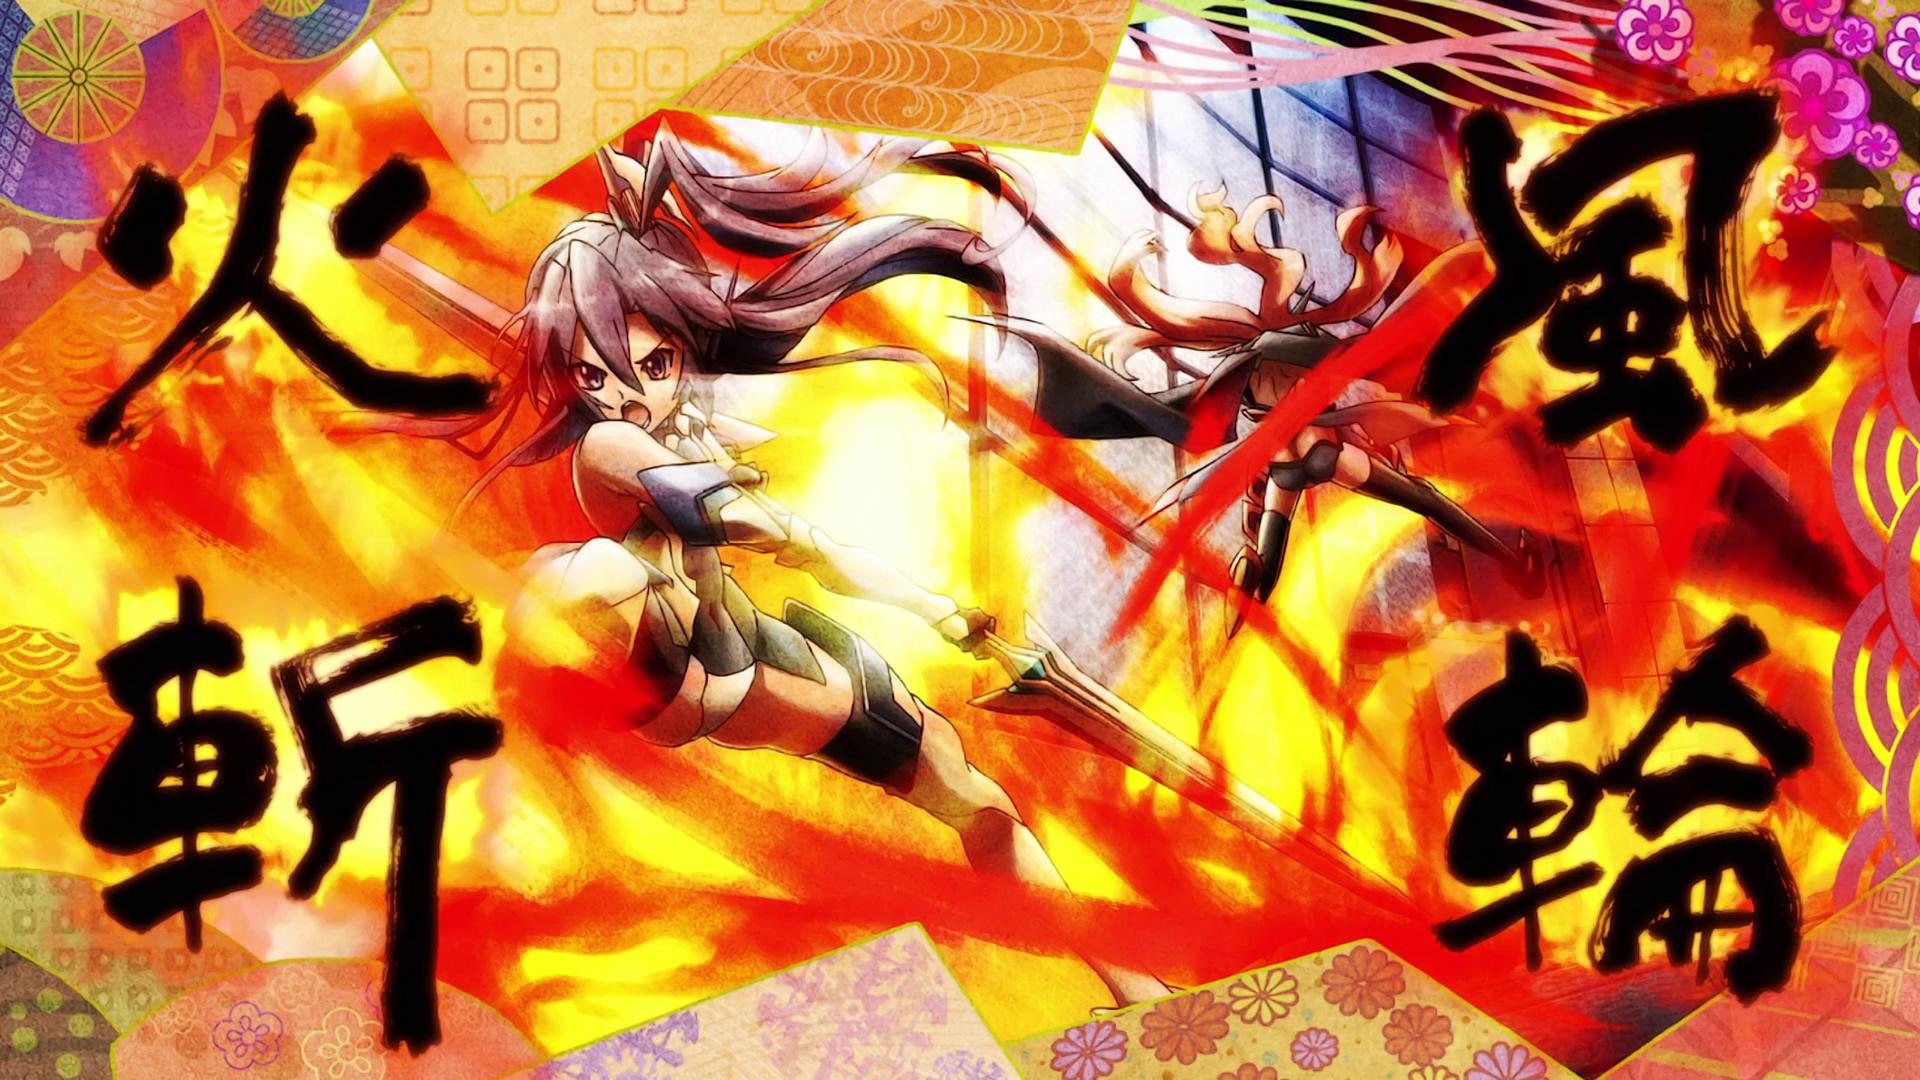 [Review] Max Factory Figma 158 - Senki Zesshou Symphogear - Tsubasa Kazanari Latest?cb=20130713201413